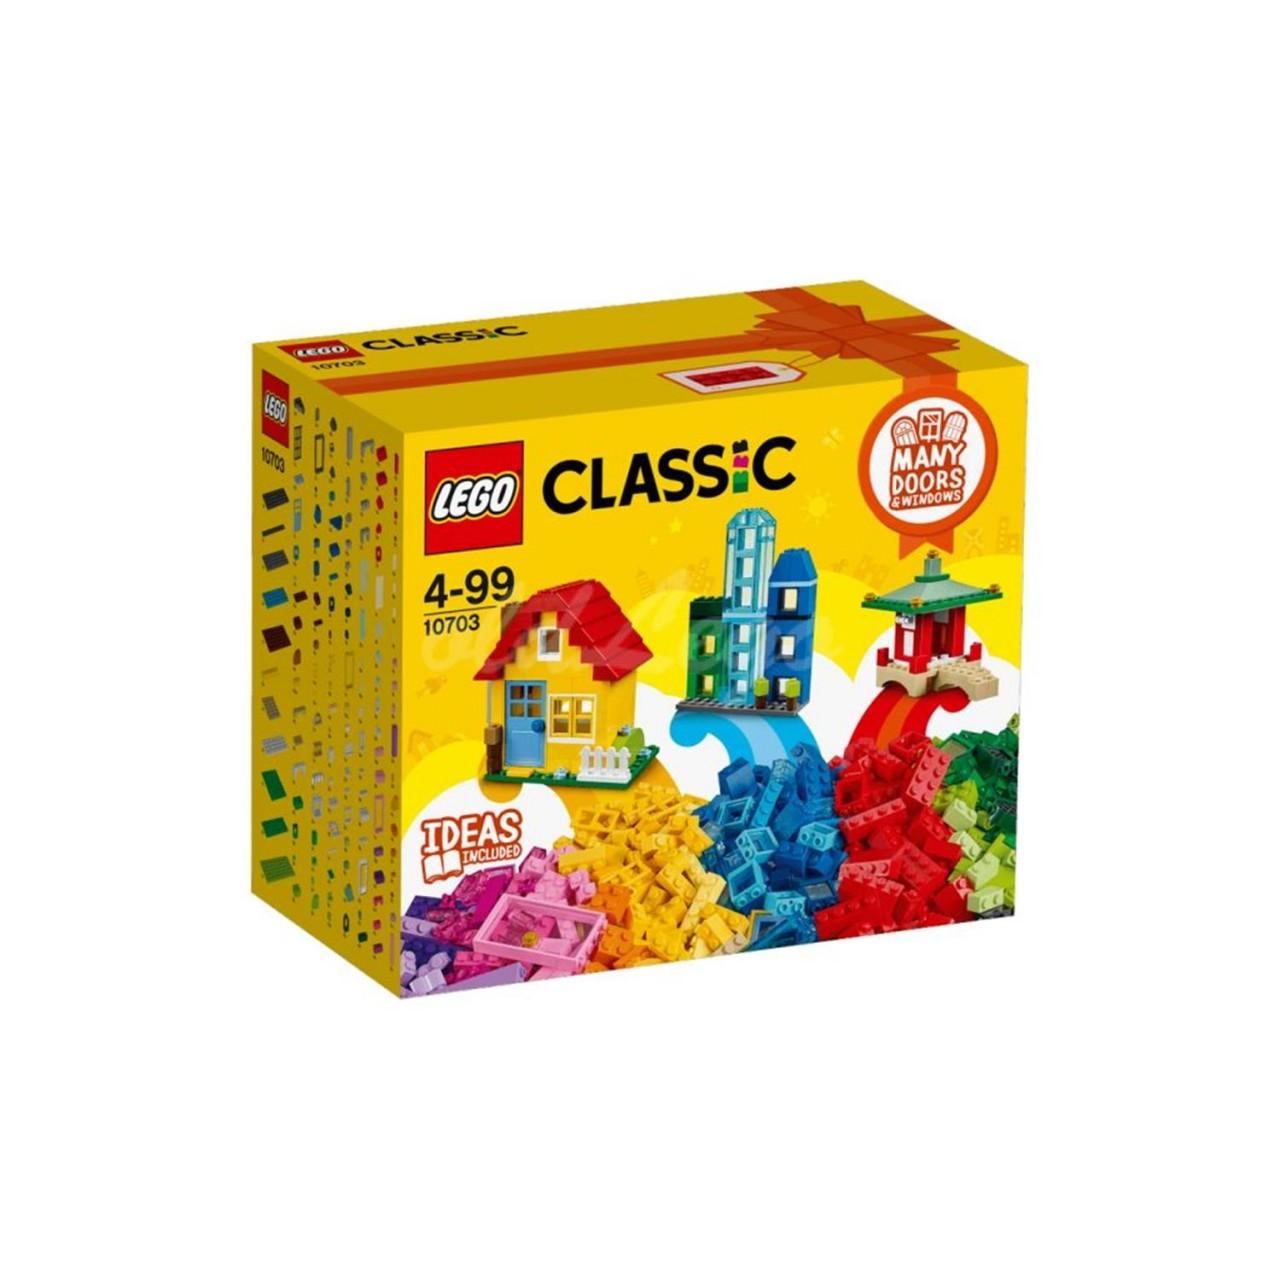 LEGO CLASSIC 10703 Kreativ-Bauset Gebäude